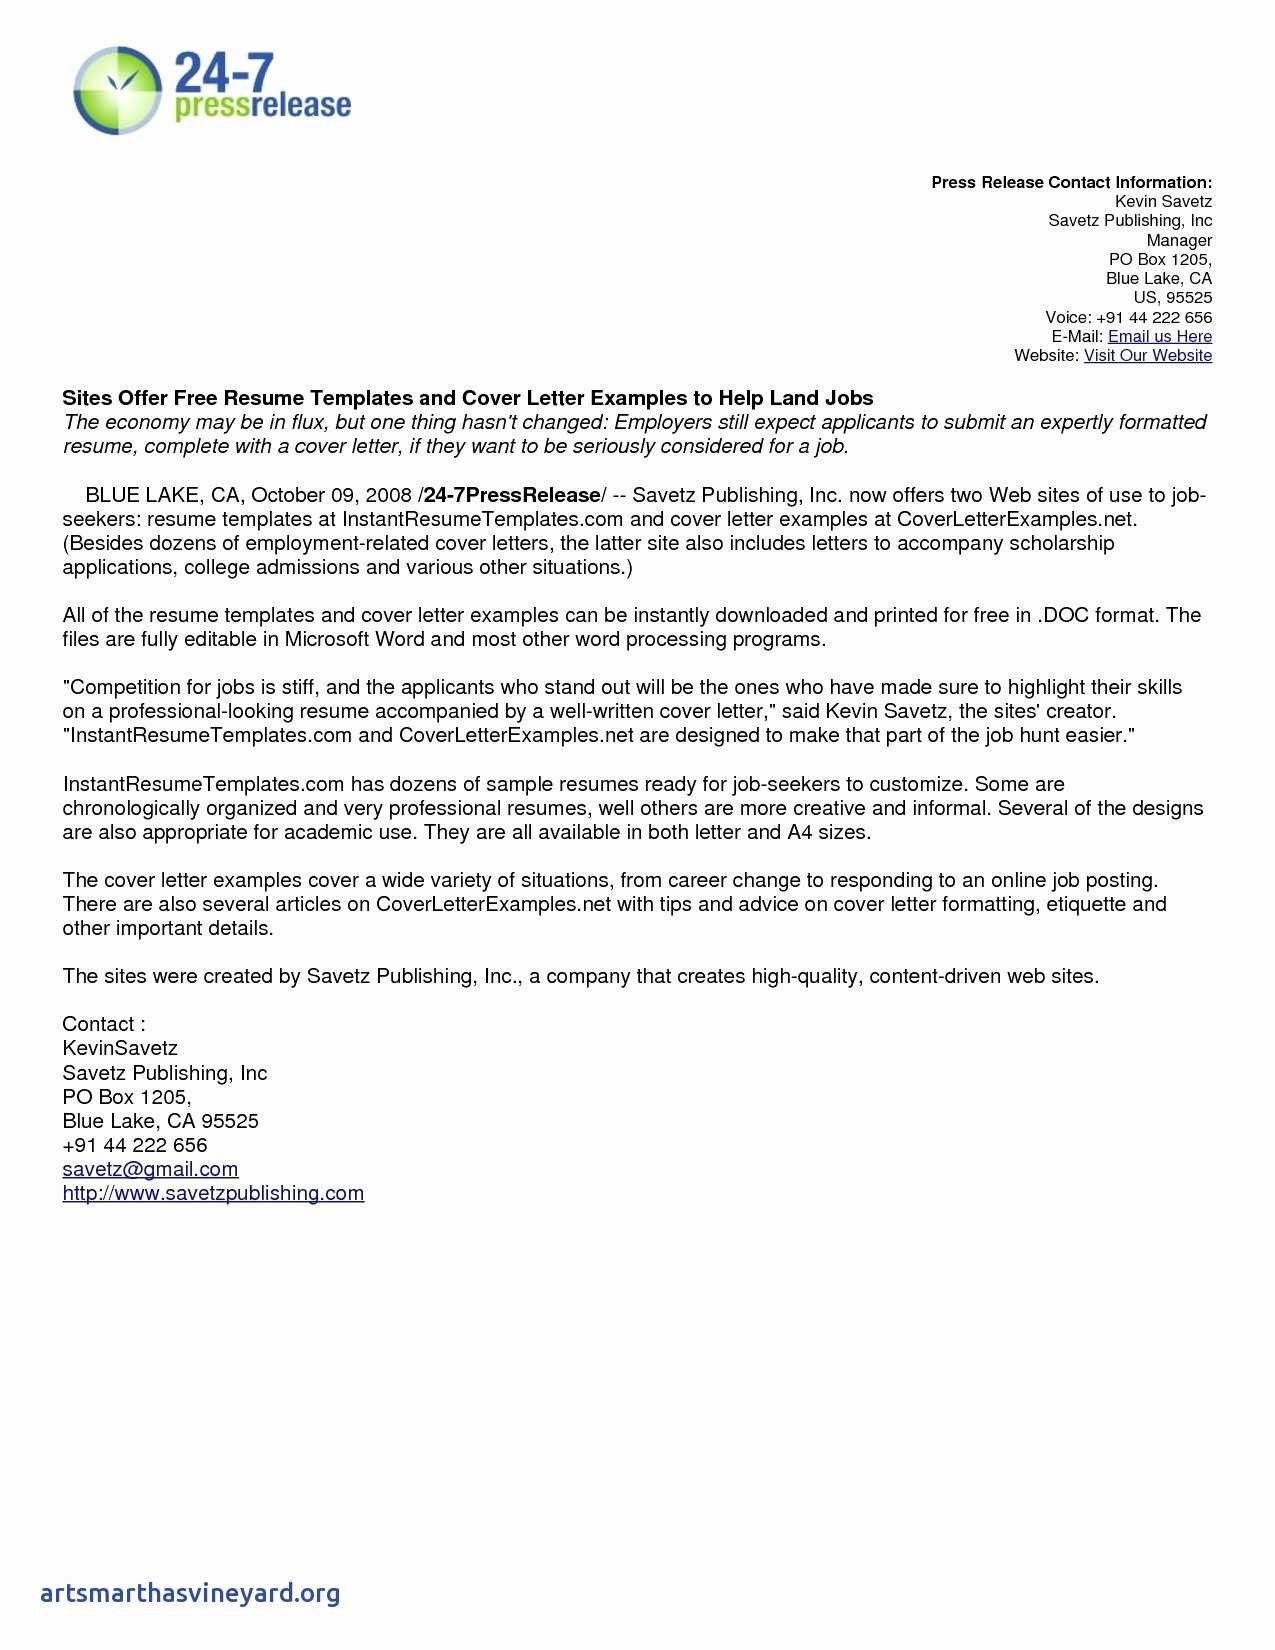 Job Application Free Printable Resume Templates Microsoft Word